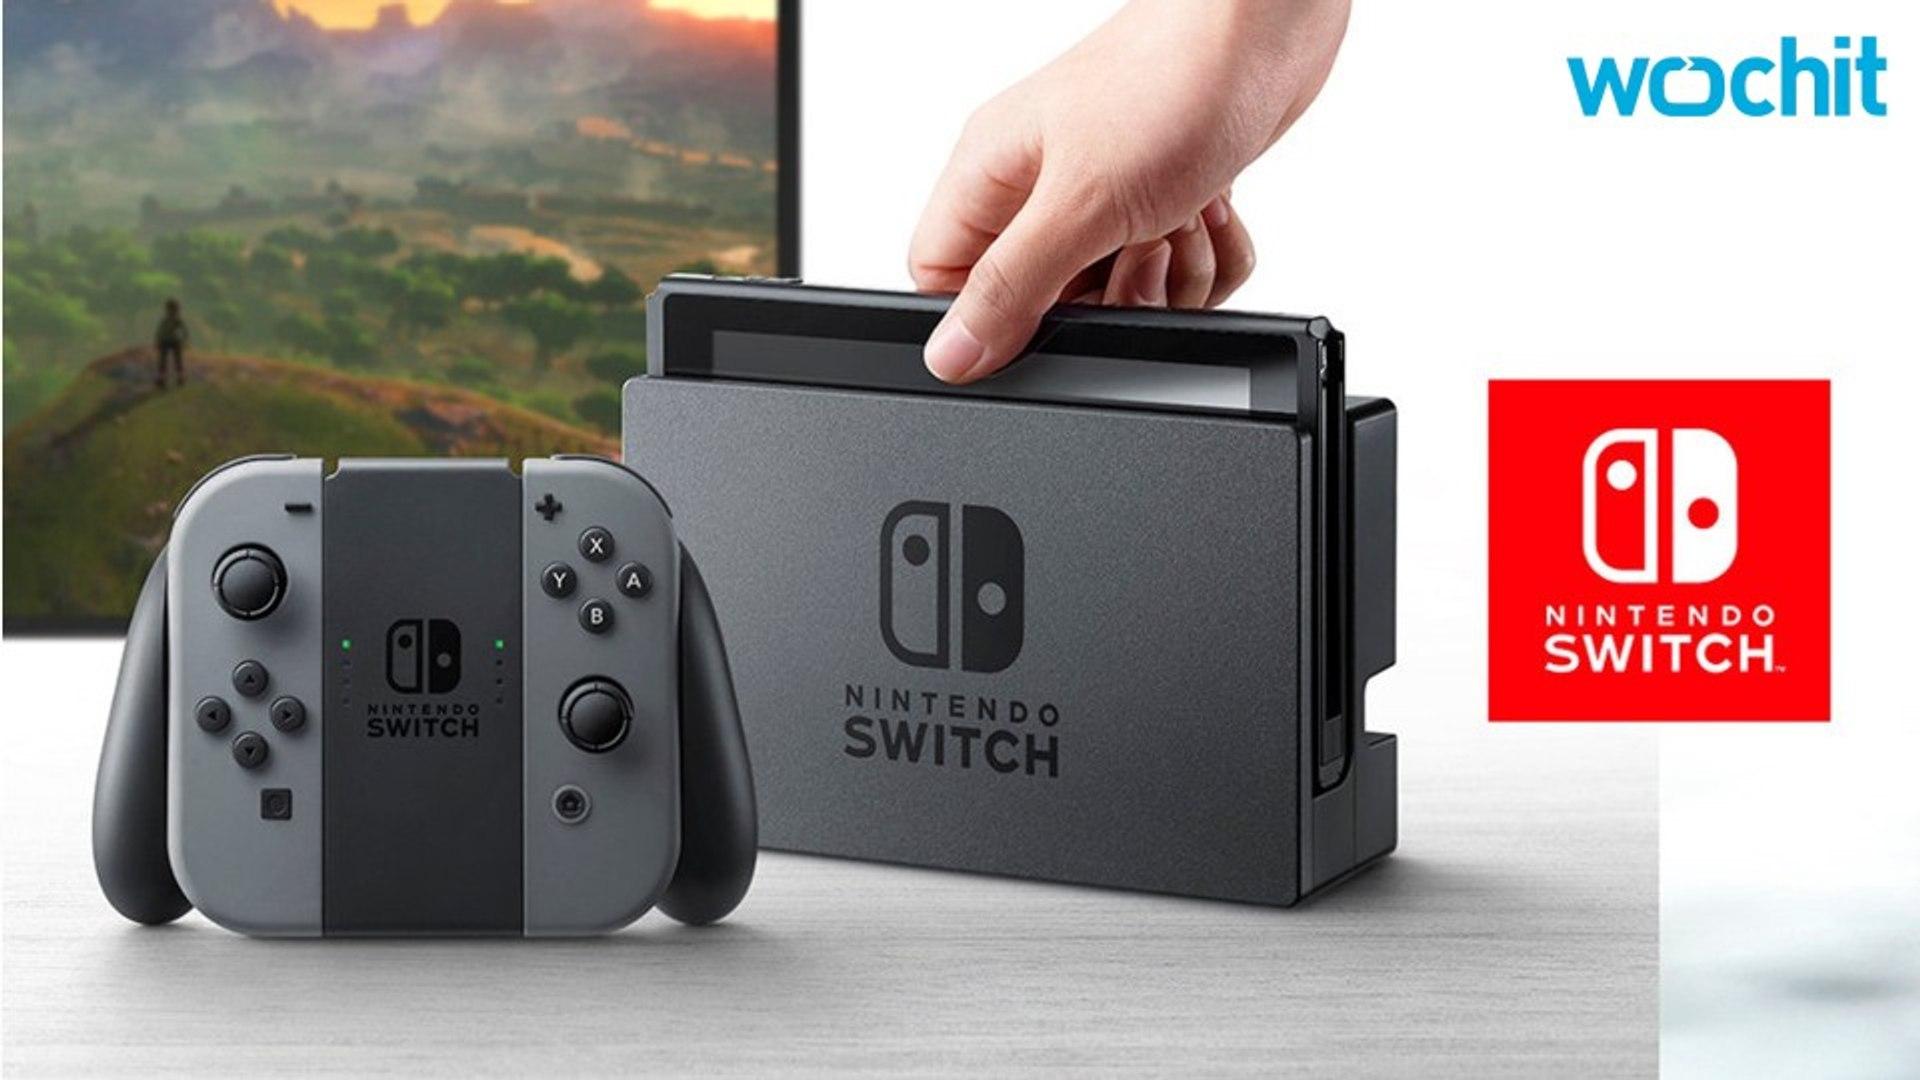 Nintendo Switch Tours the U.S.